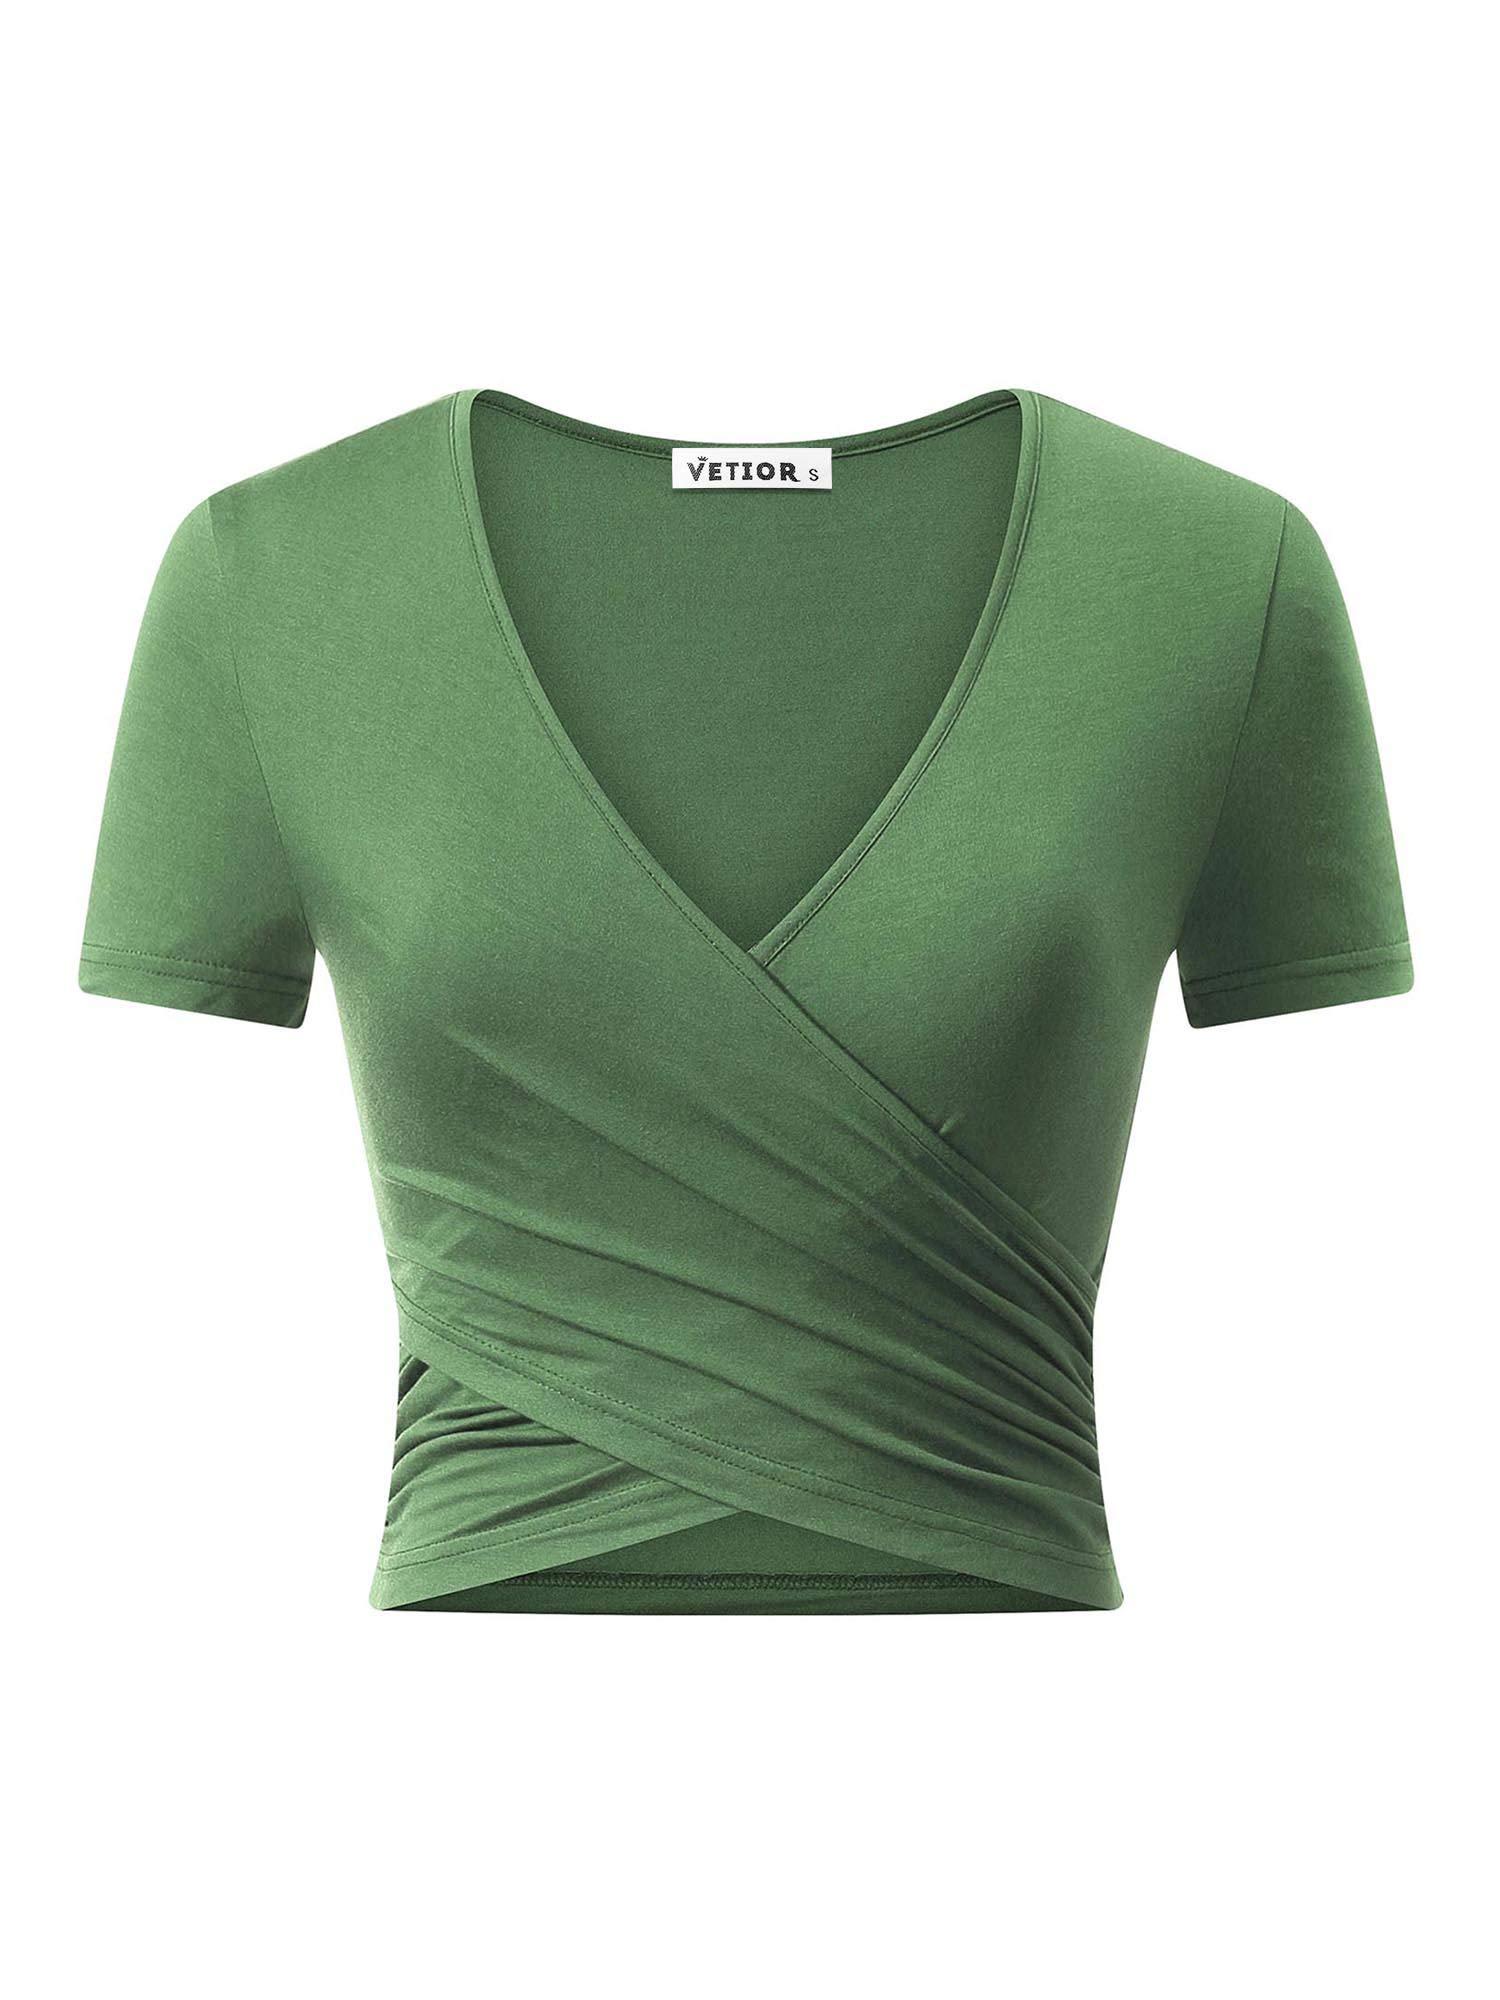 VETIOR Women's Deep V Neck Short Sleeve Unique Slim Fit Coss Wrap Shirts Crop Tops